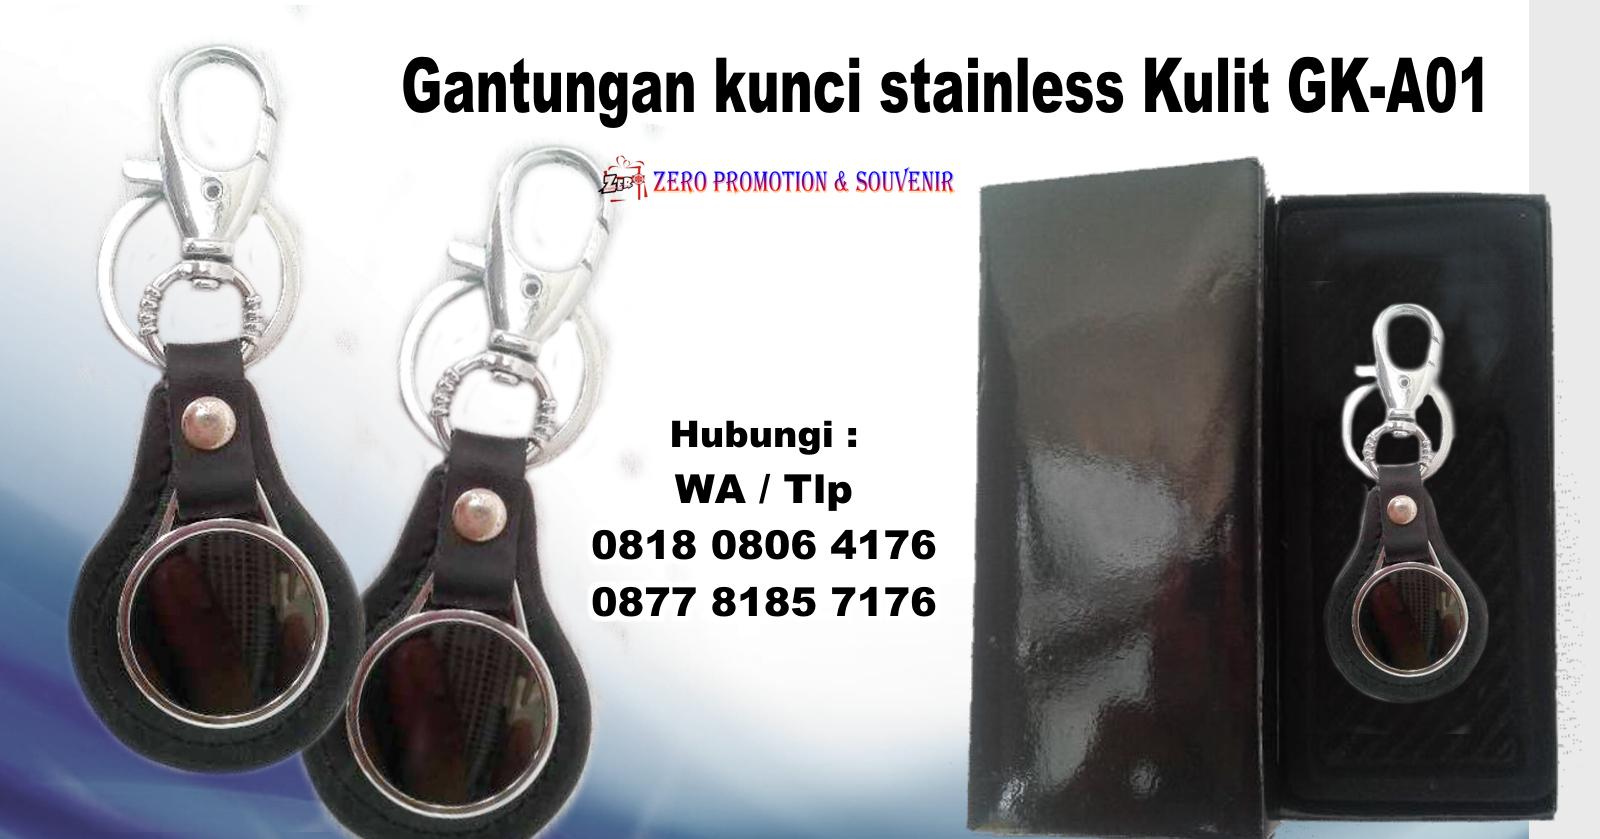 Souvenir Kantor Gantungan Kunci Stainless Kulit Gk A01 Barang Sovenir